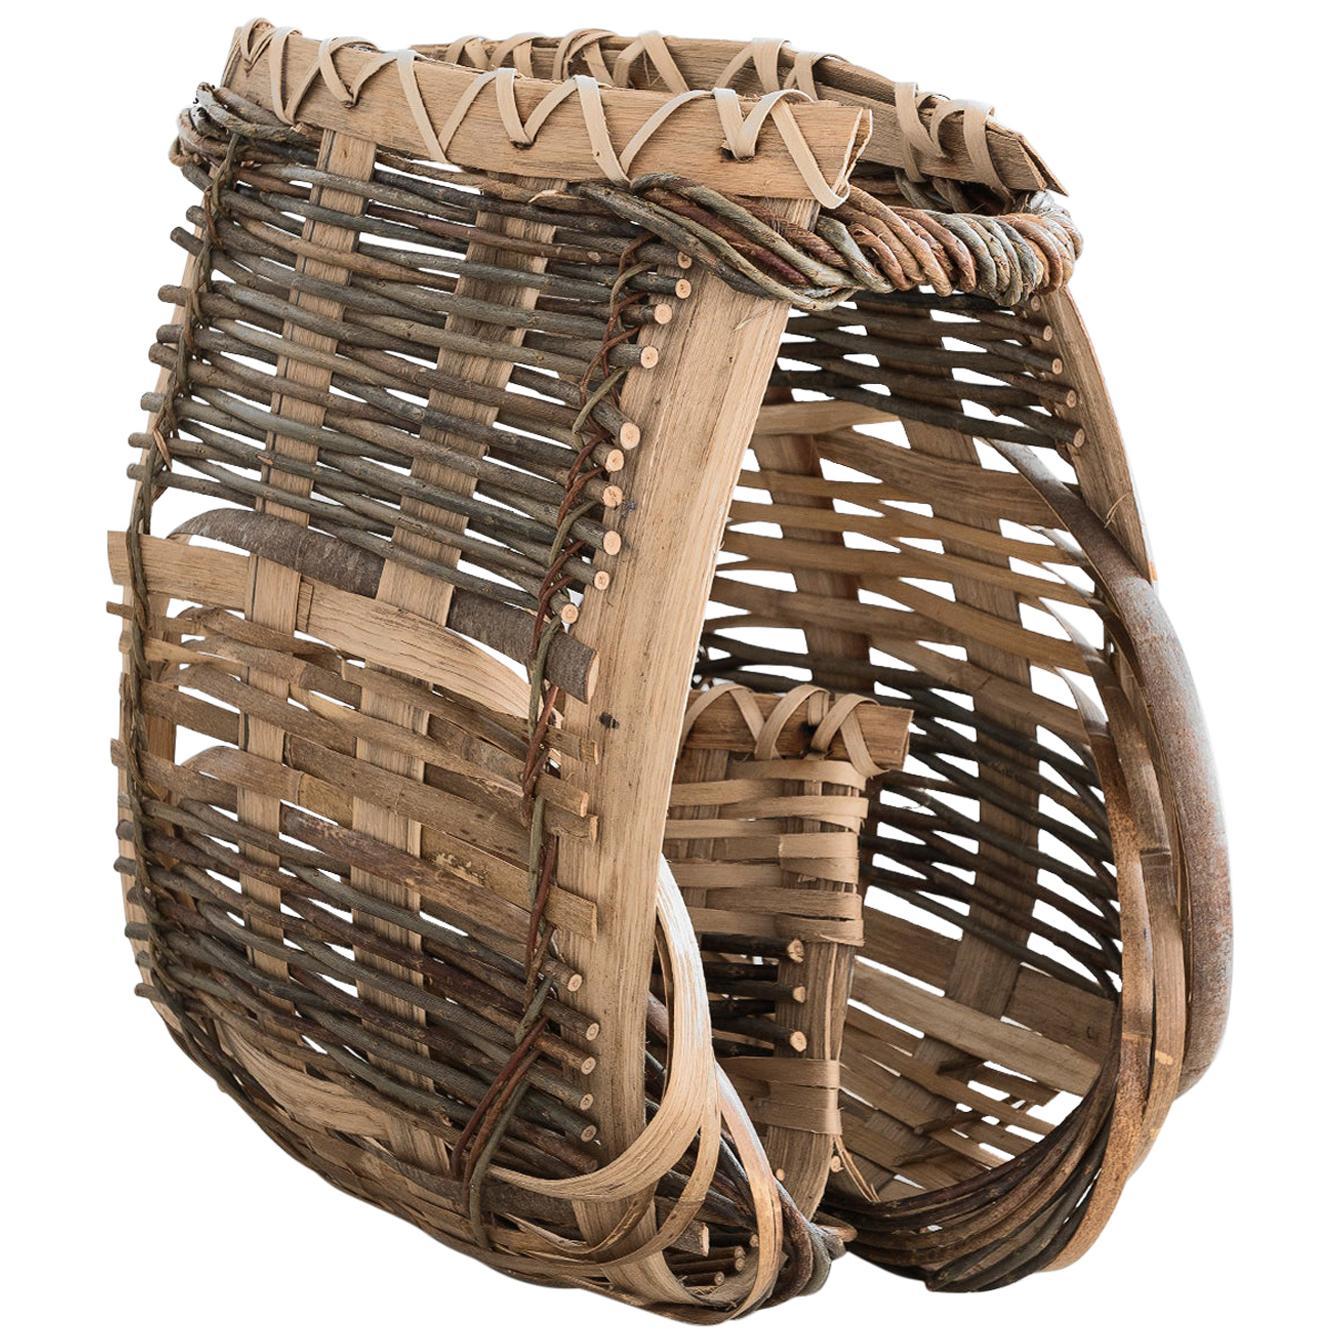 "Hilary Burns Pair of baskets ""Catalan Carpace"", Willow, Contemporary Craft, 2020"